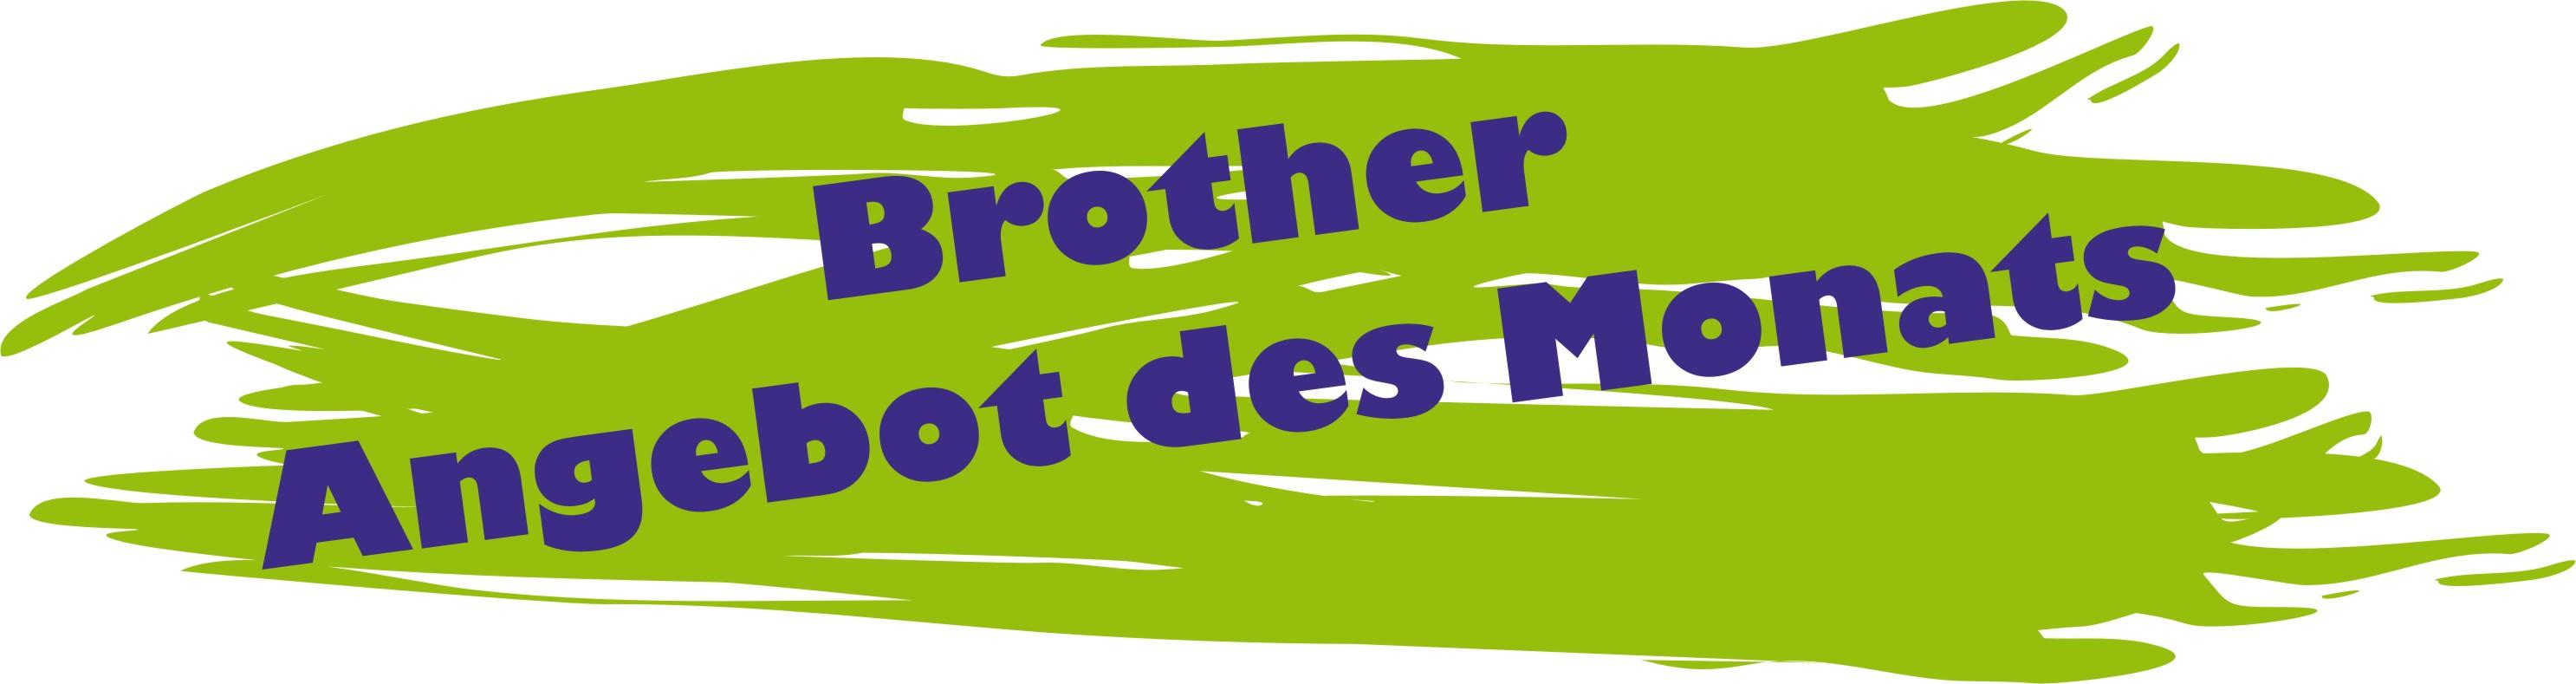 Ueberschrift_ADM